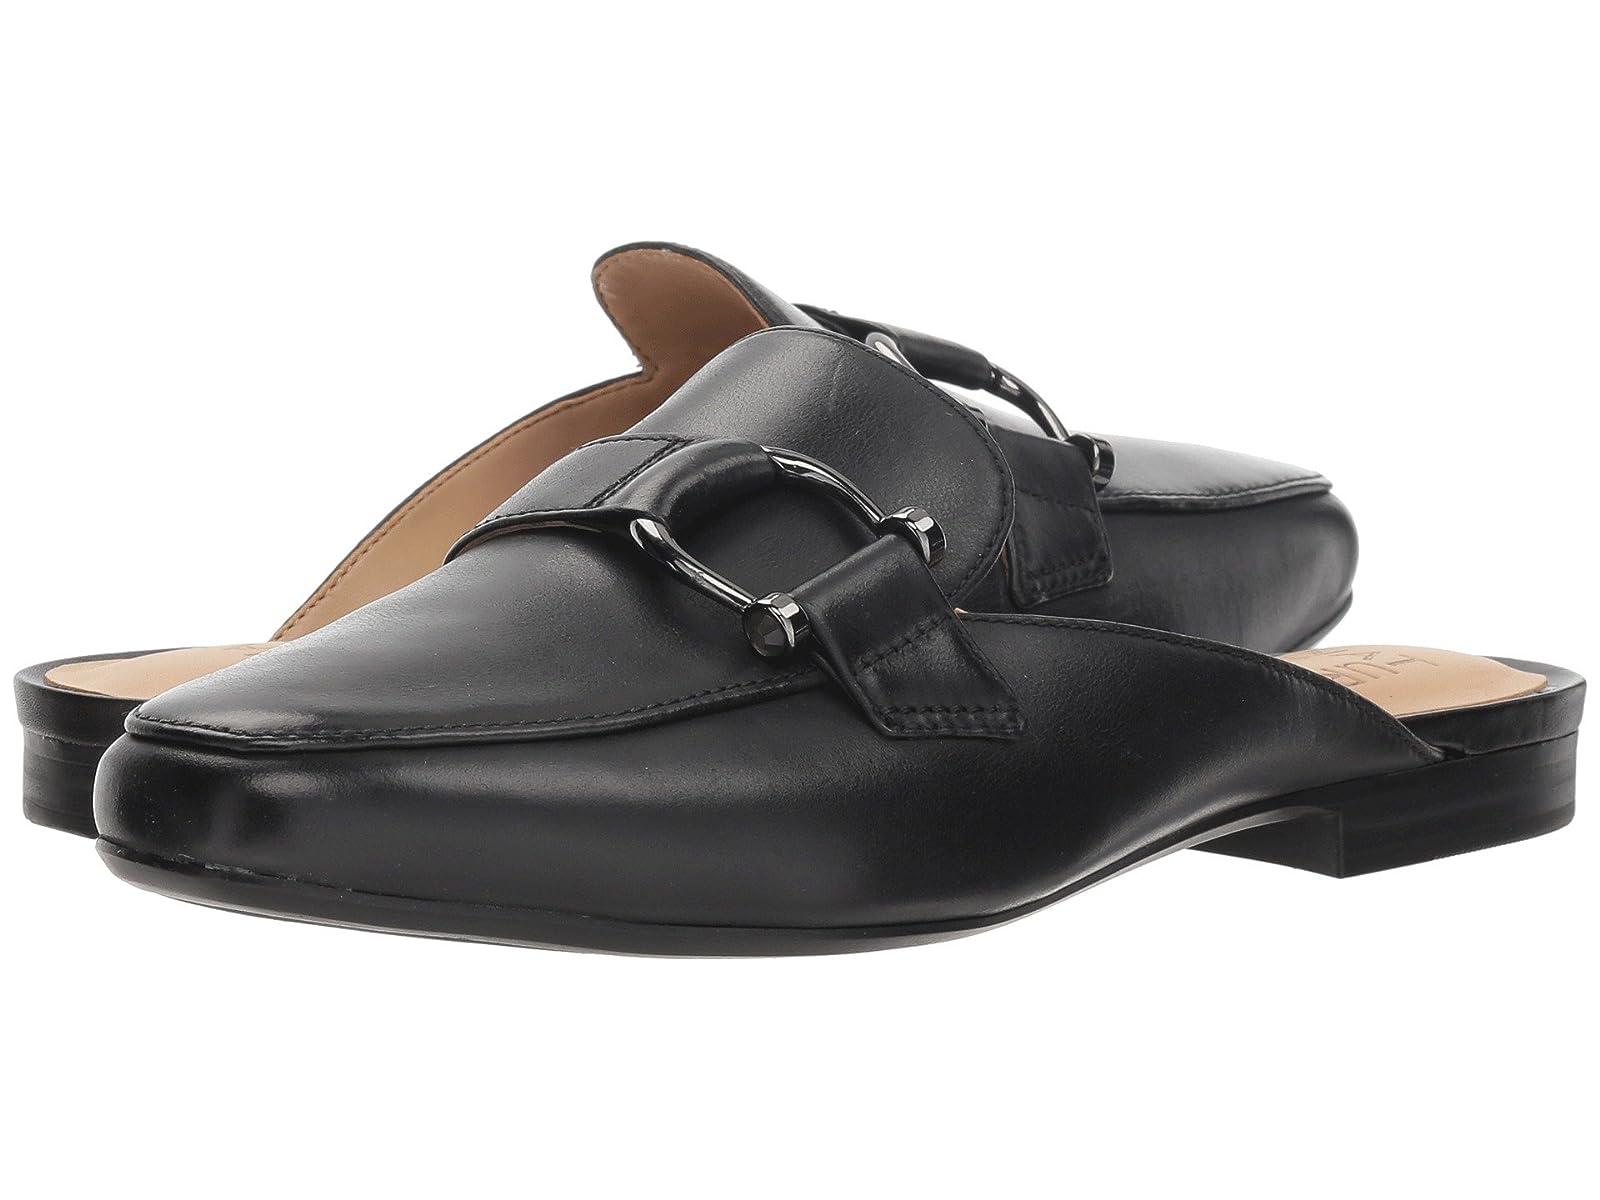 Naturalizer EttaAtmospheric grades have affordable shoes